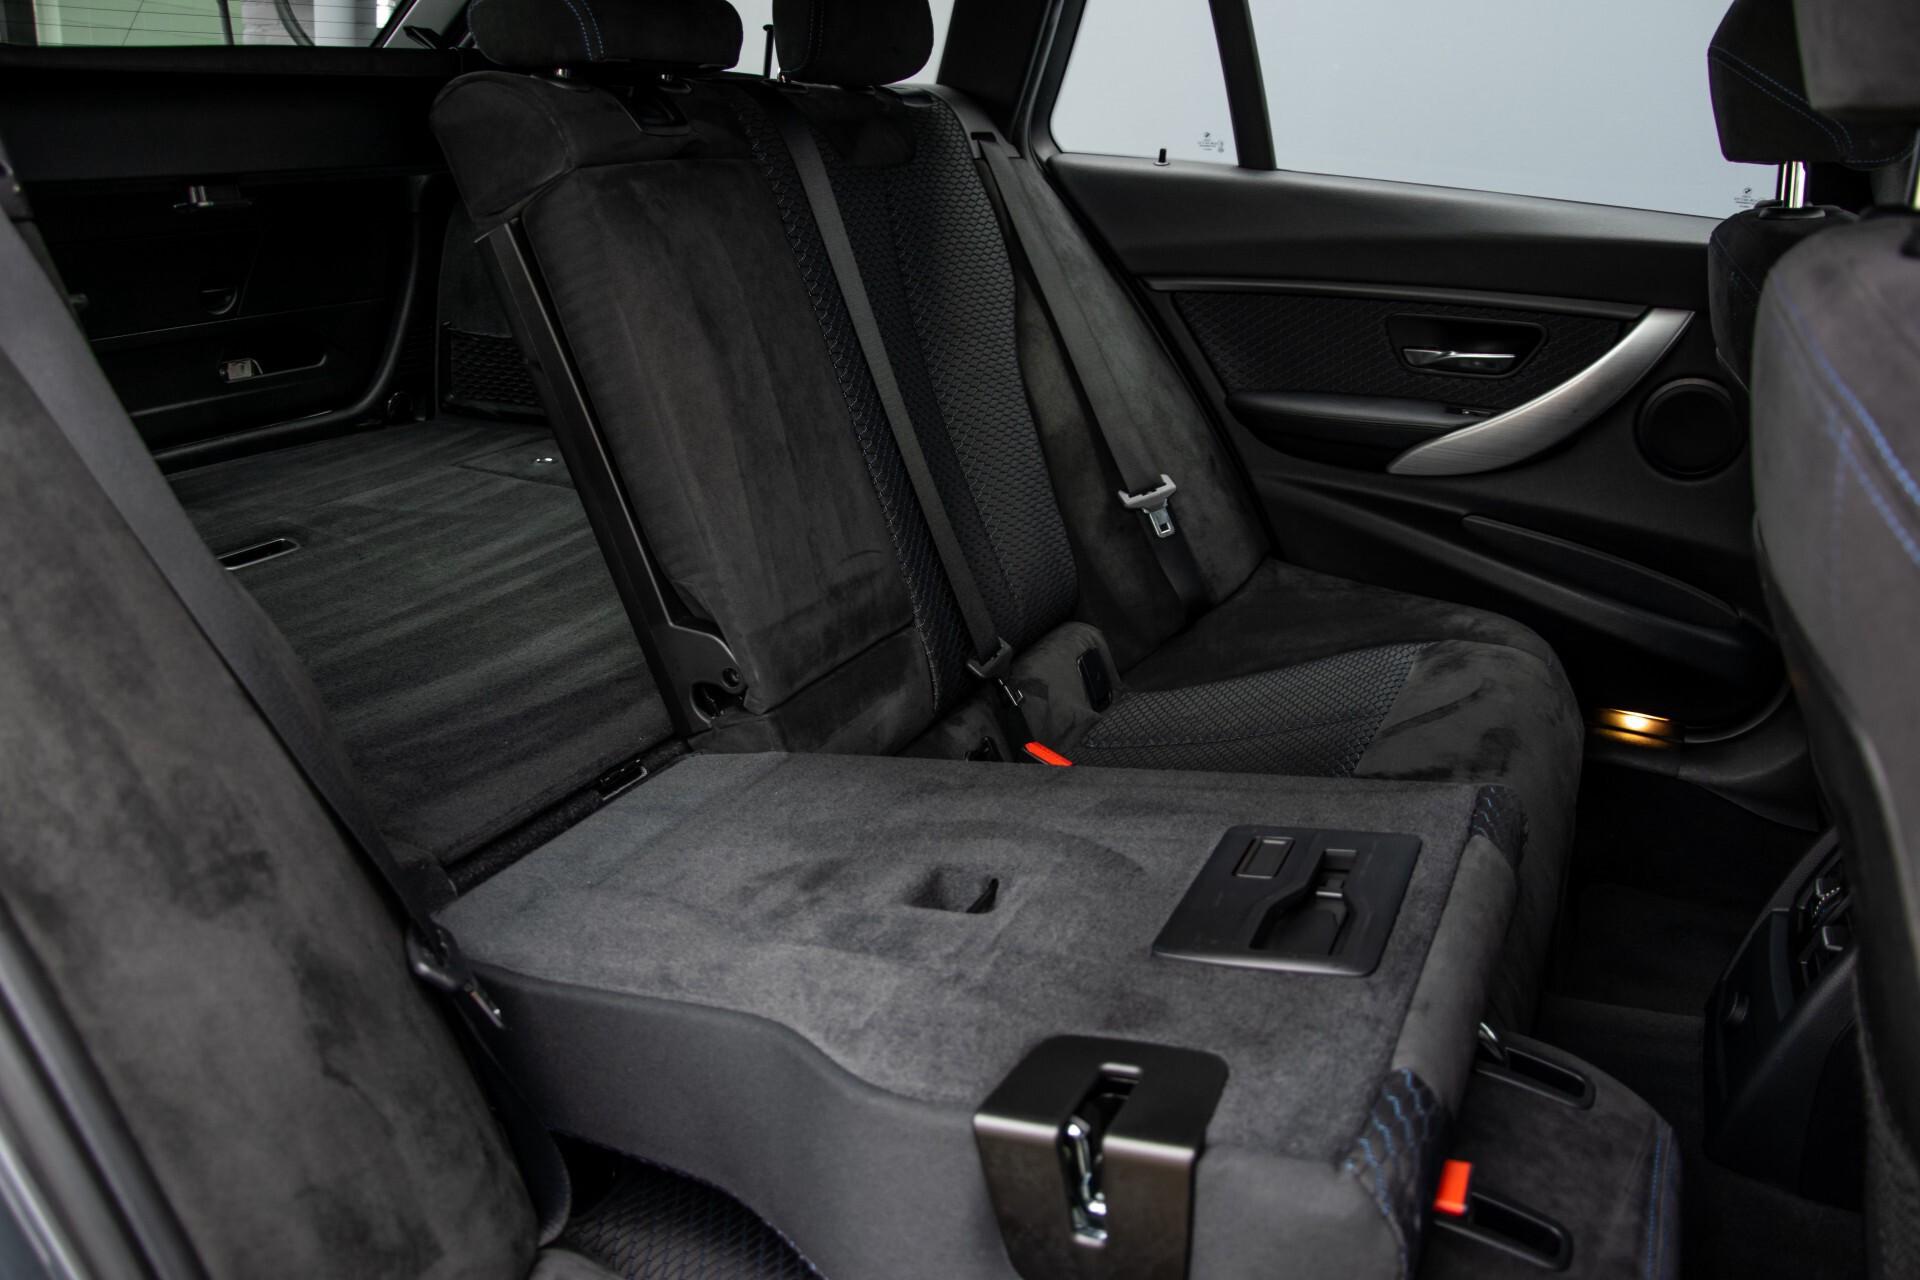 BMW 3 Serie Touring 316i M-Sportpakket Executive NL Auto/NAP Aut8 Foto 6